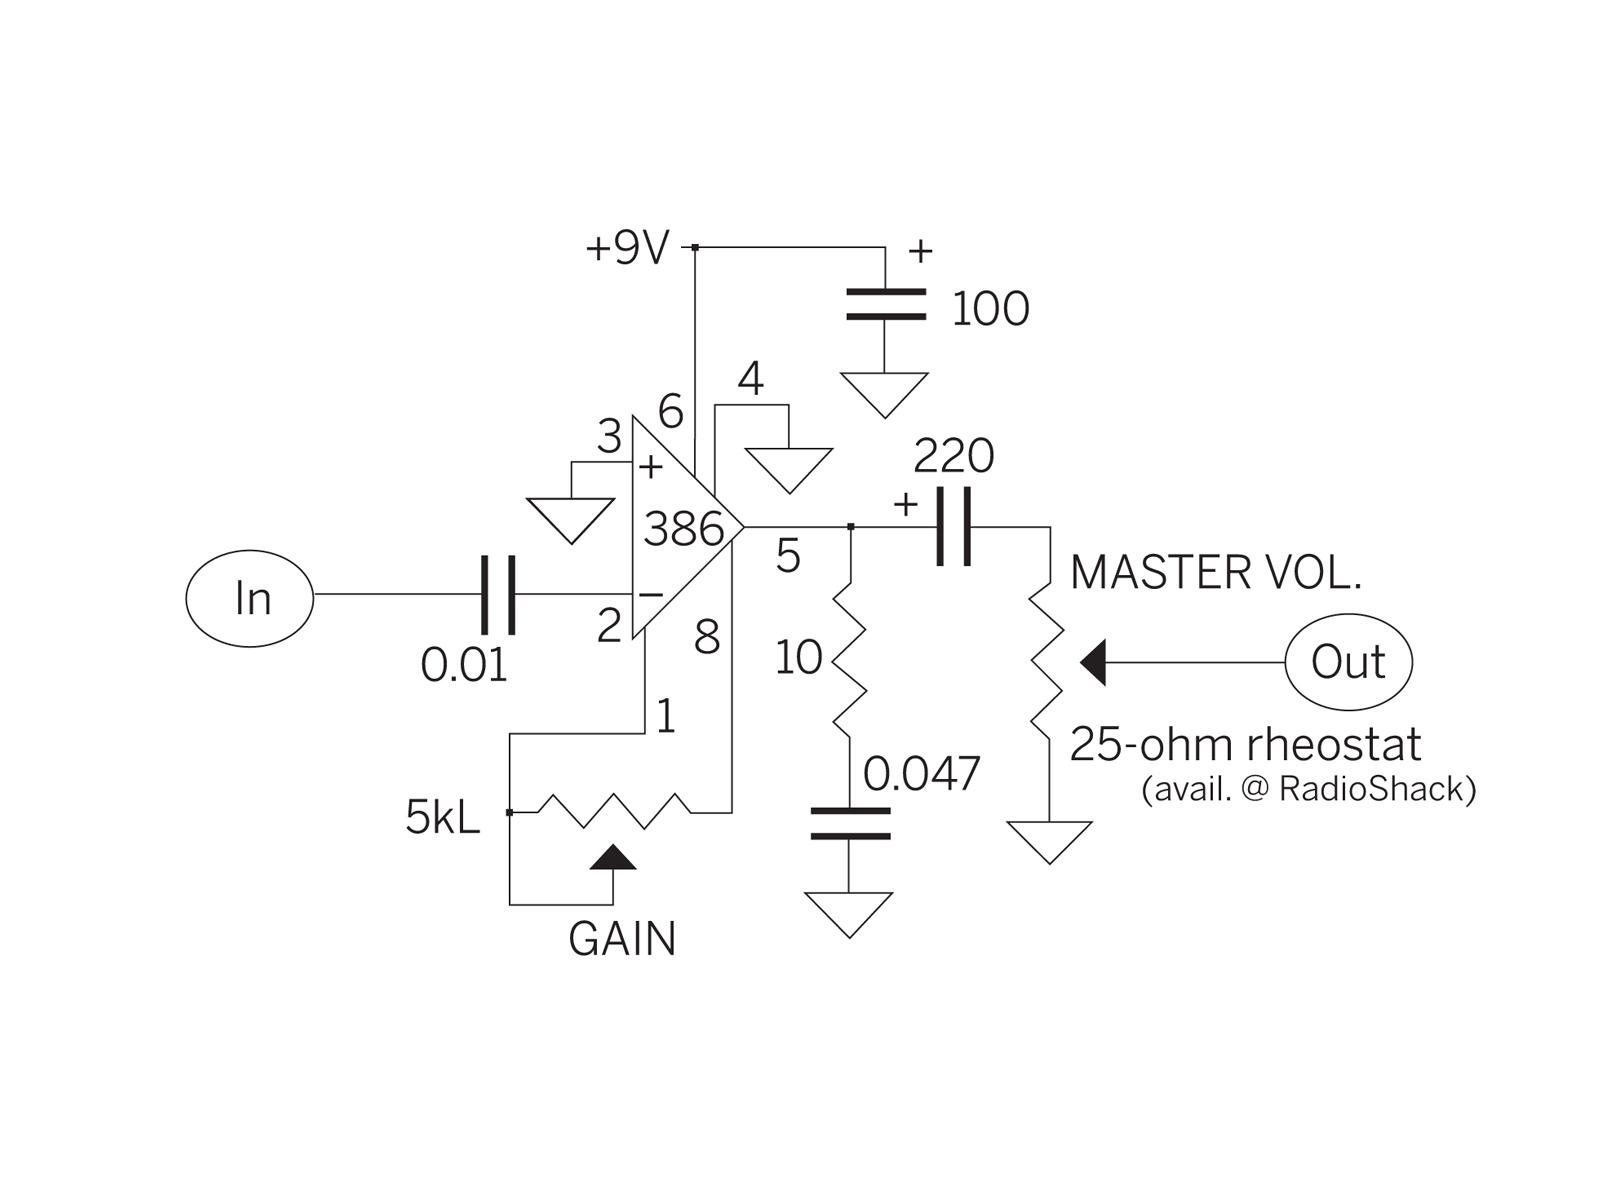 lm386 cigar box amp wiring diagram my wiring diagram cigar box guitar mini amp lm386 [ 1600 x 1200 Pixel ]